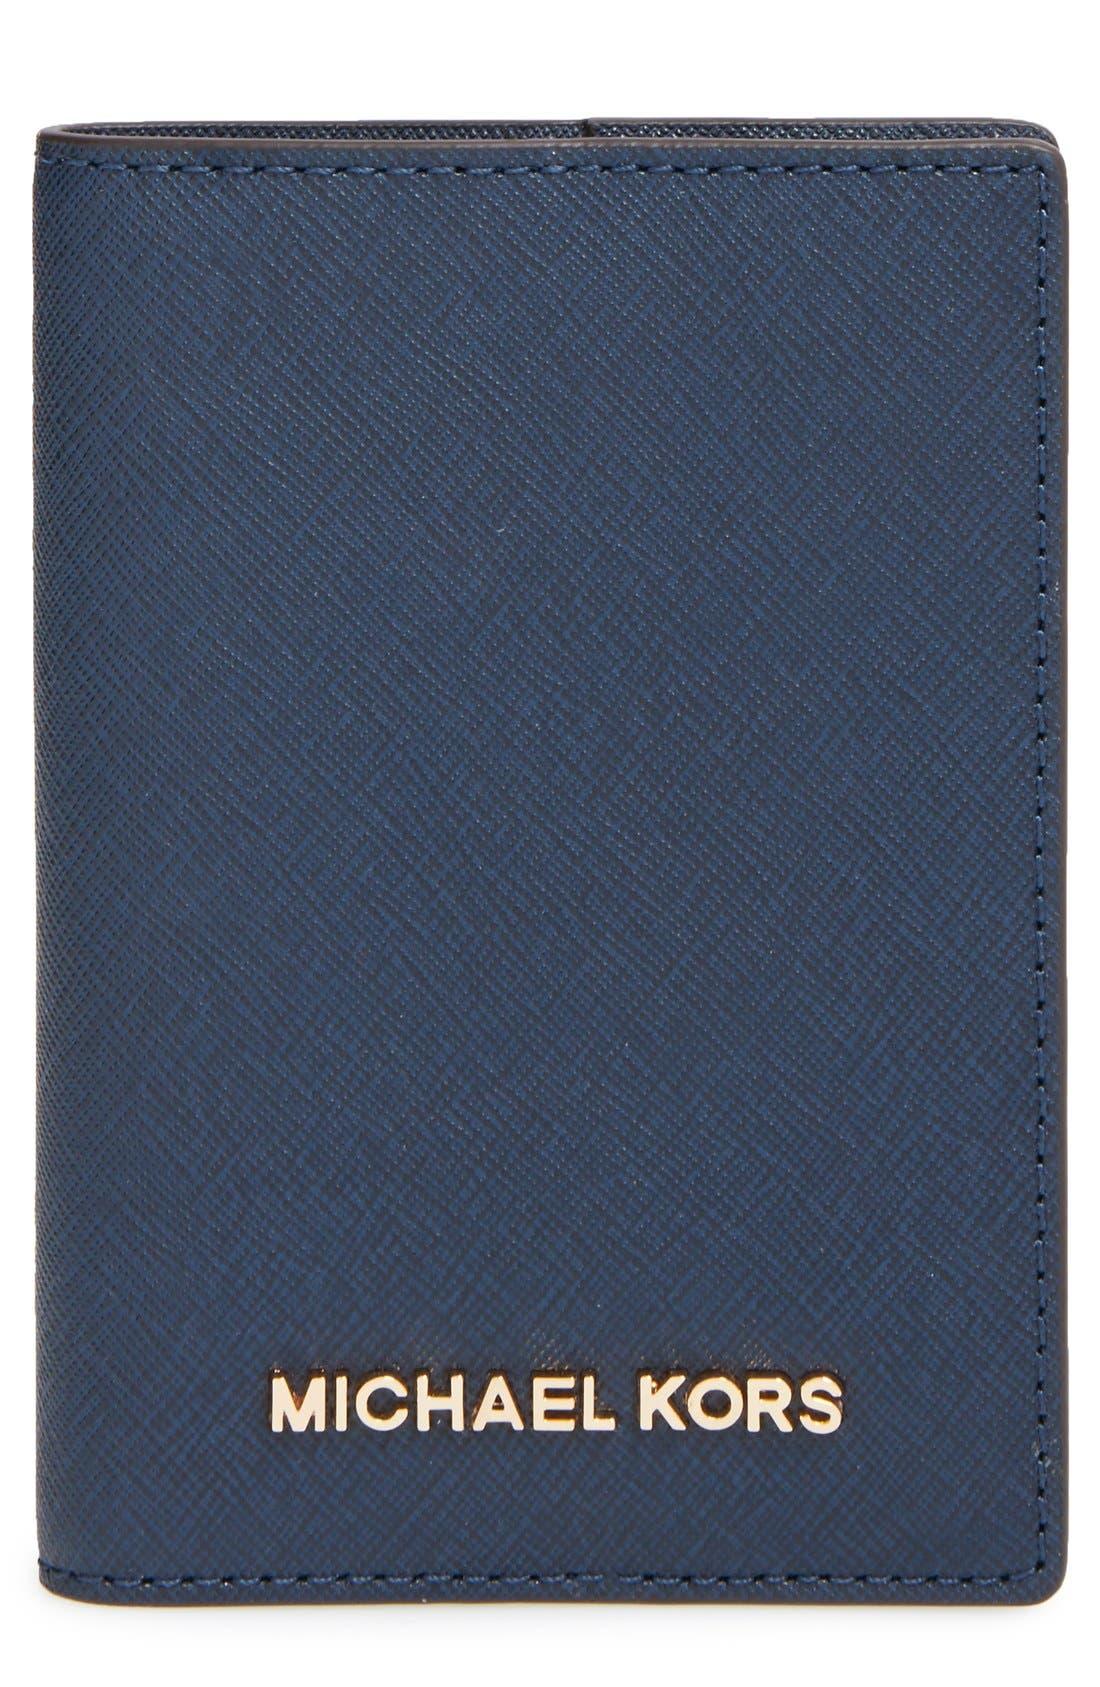 Main Image - MICHAEL Michael Kors'Jet Set' Passport Case